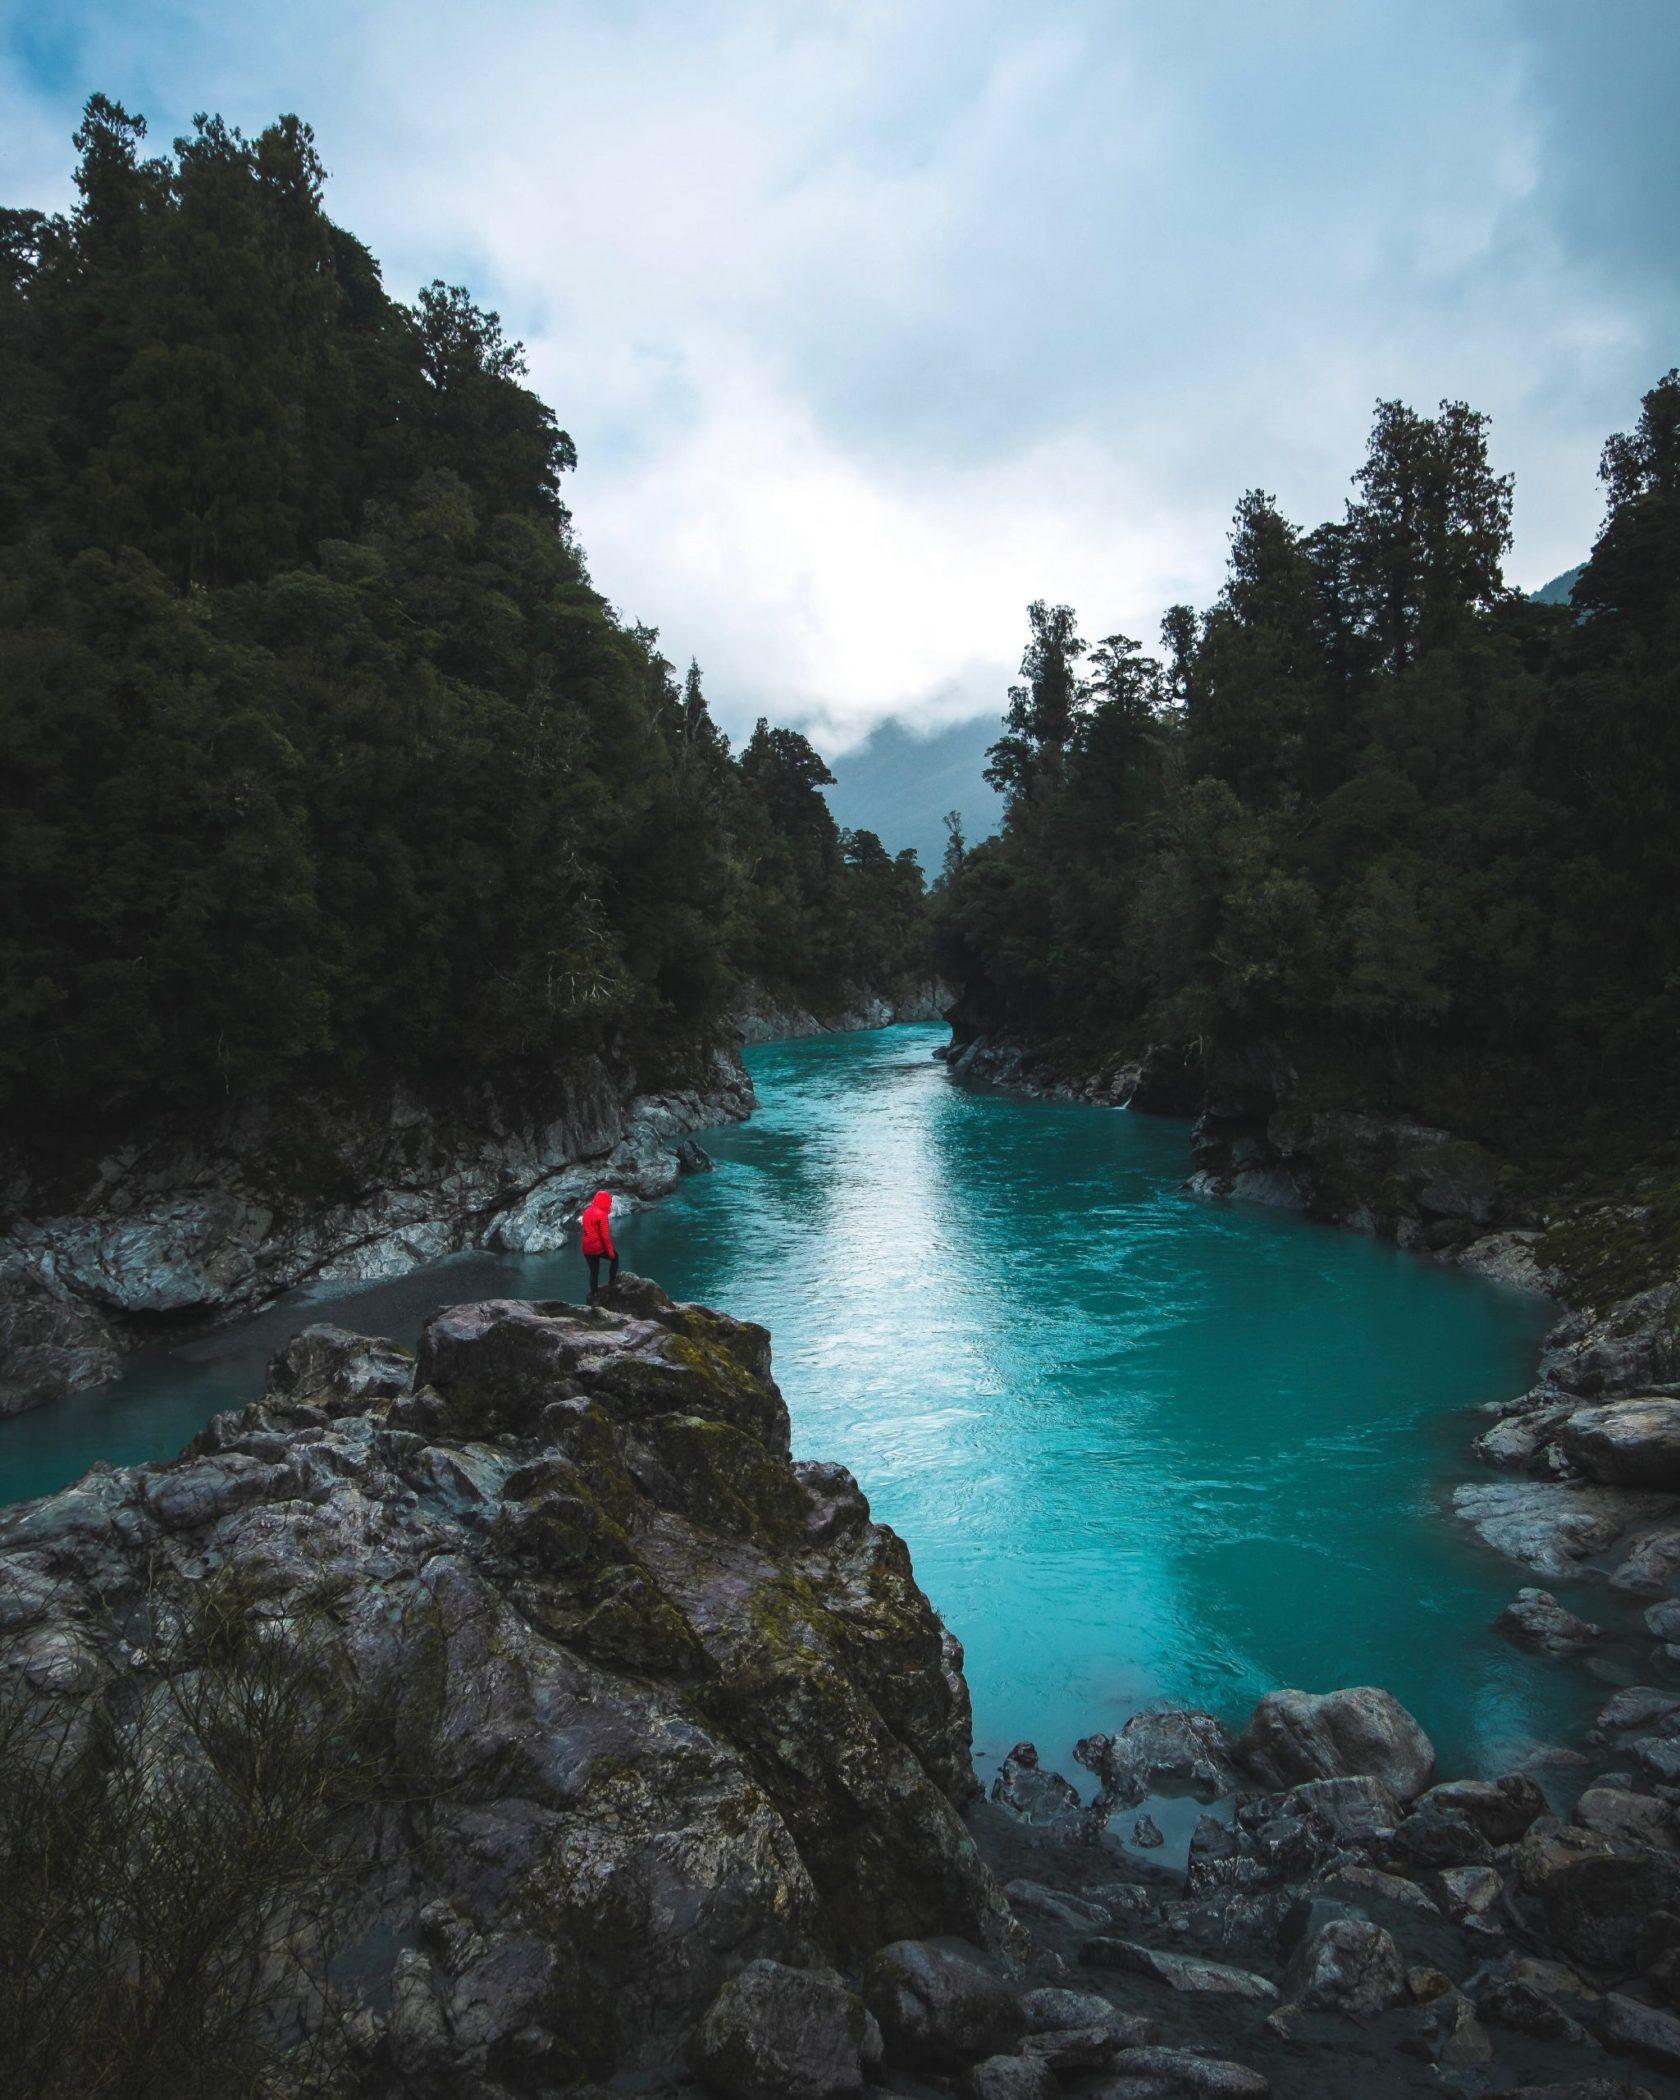 Unique perspective of Hokitika Gorge, New Zealand